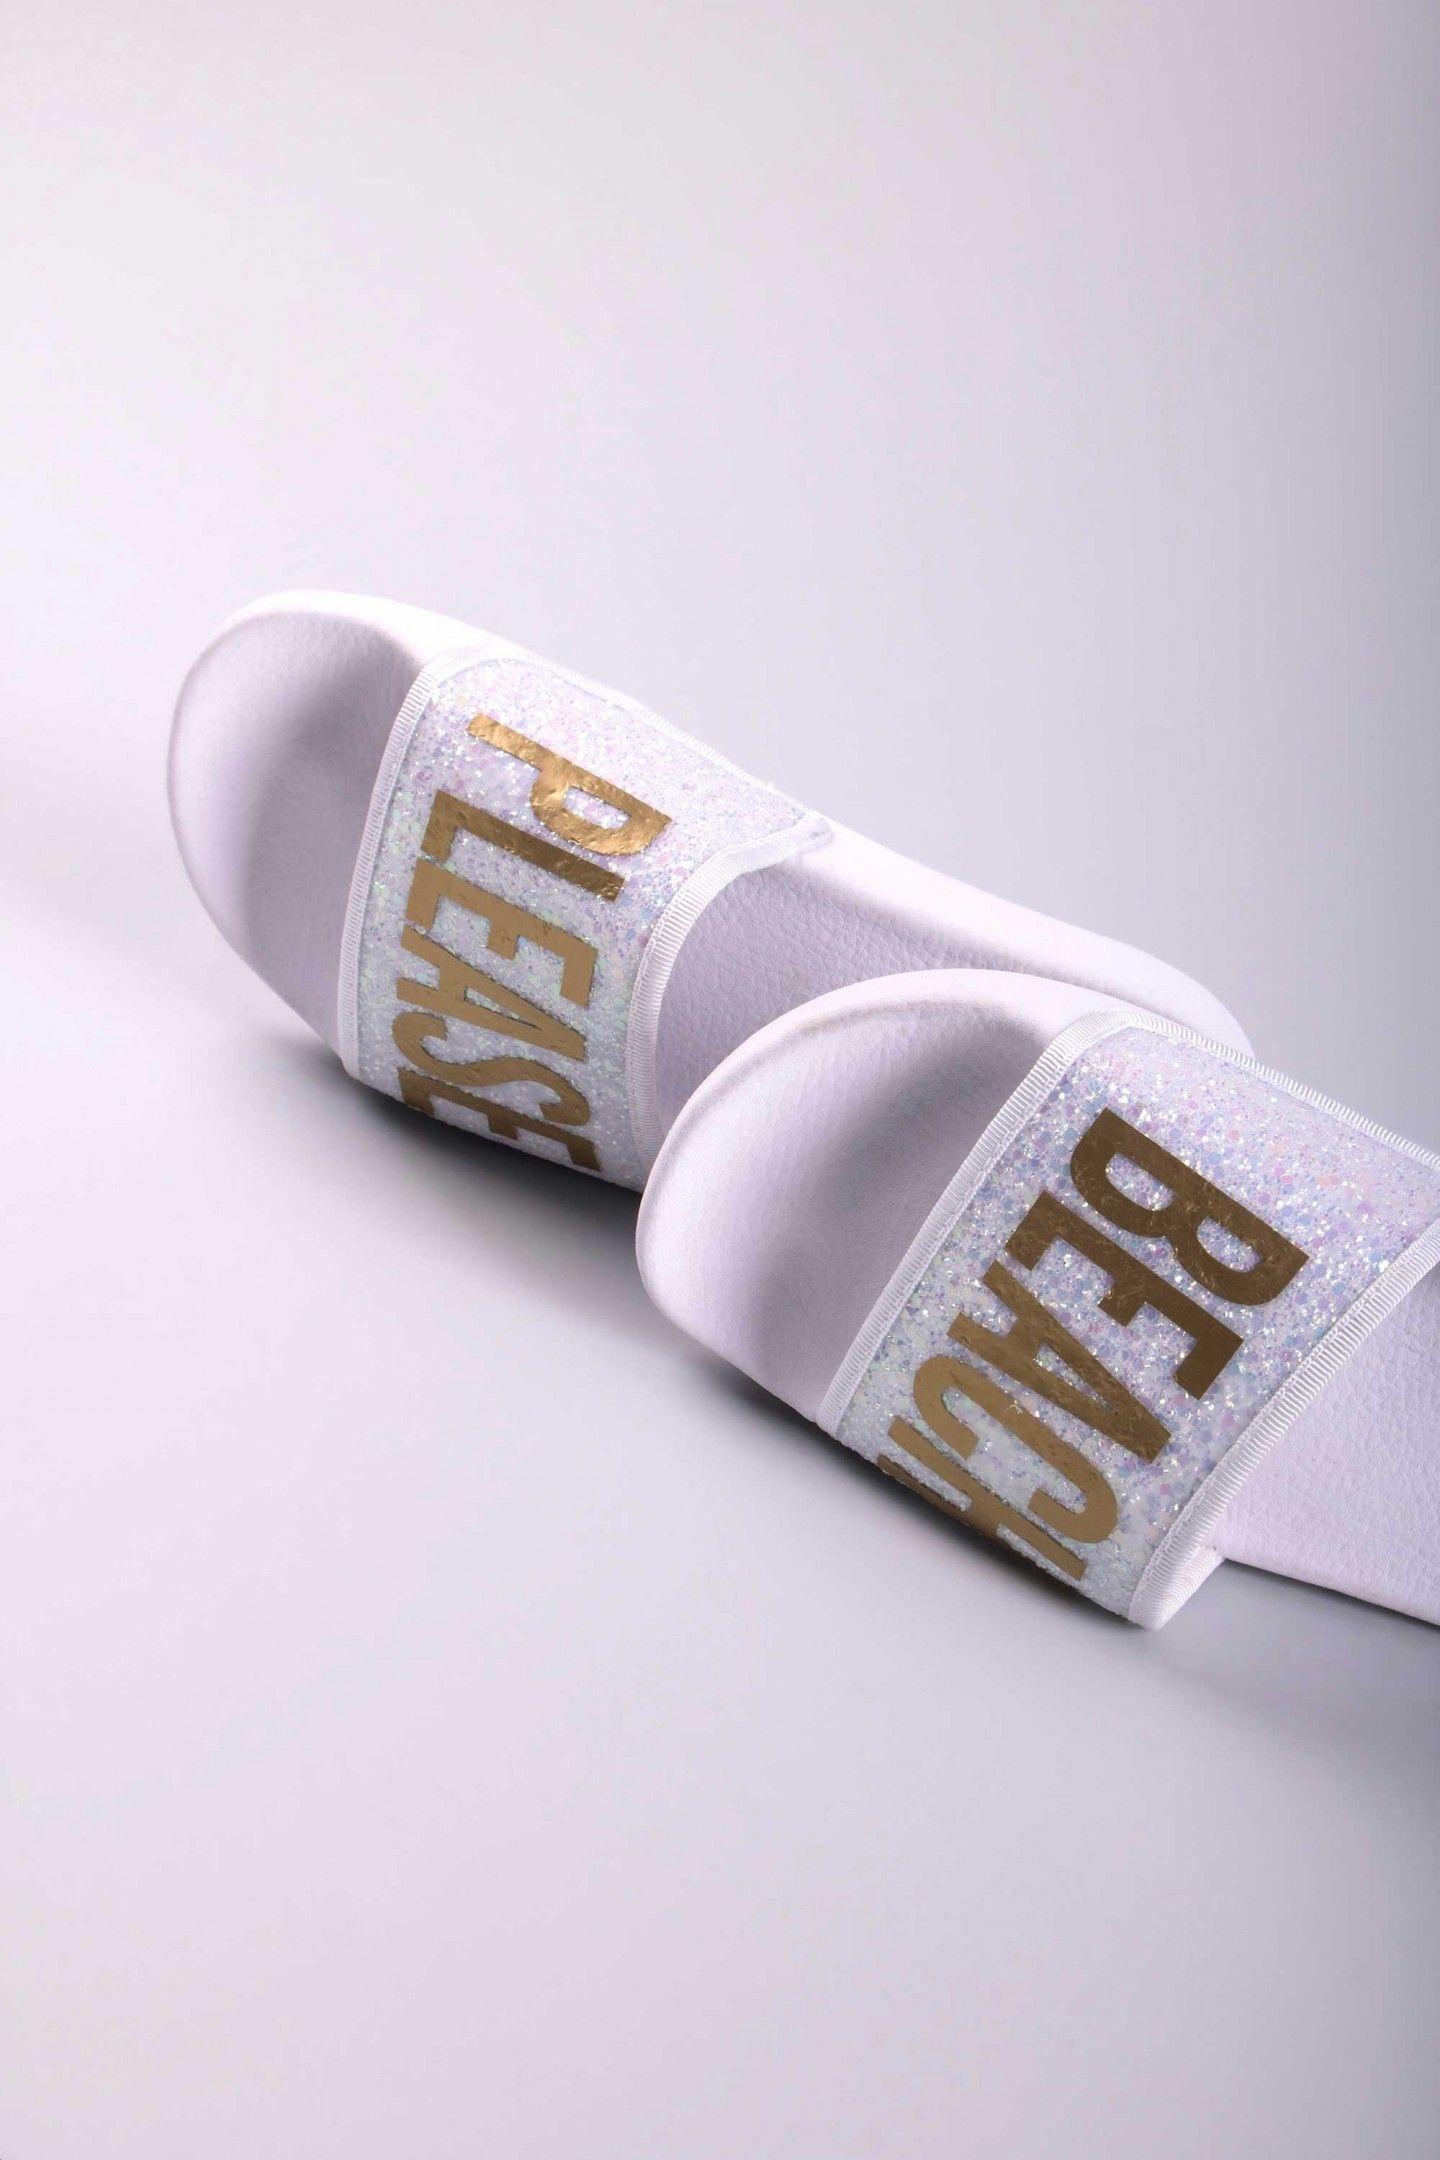 76e8369c4 GLITTER BEACH PLEASE WHITE - TheWhiteBrand SS 18 New Collection. Women s  flat slide sandal